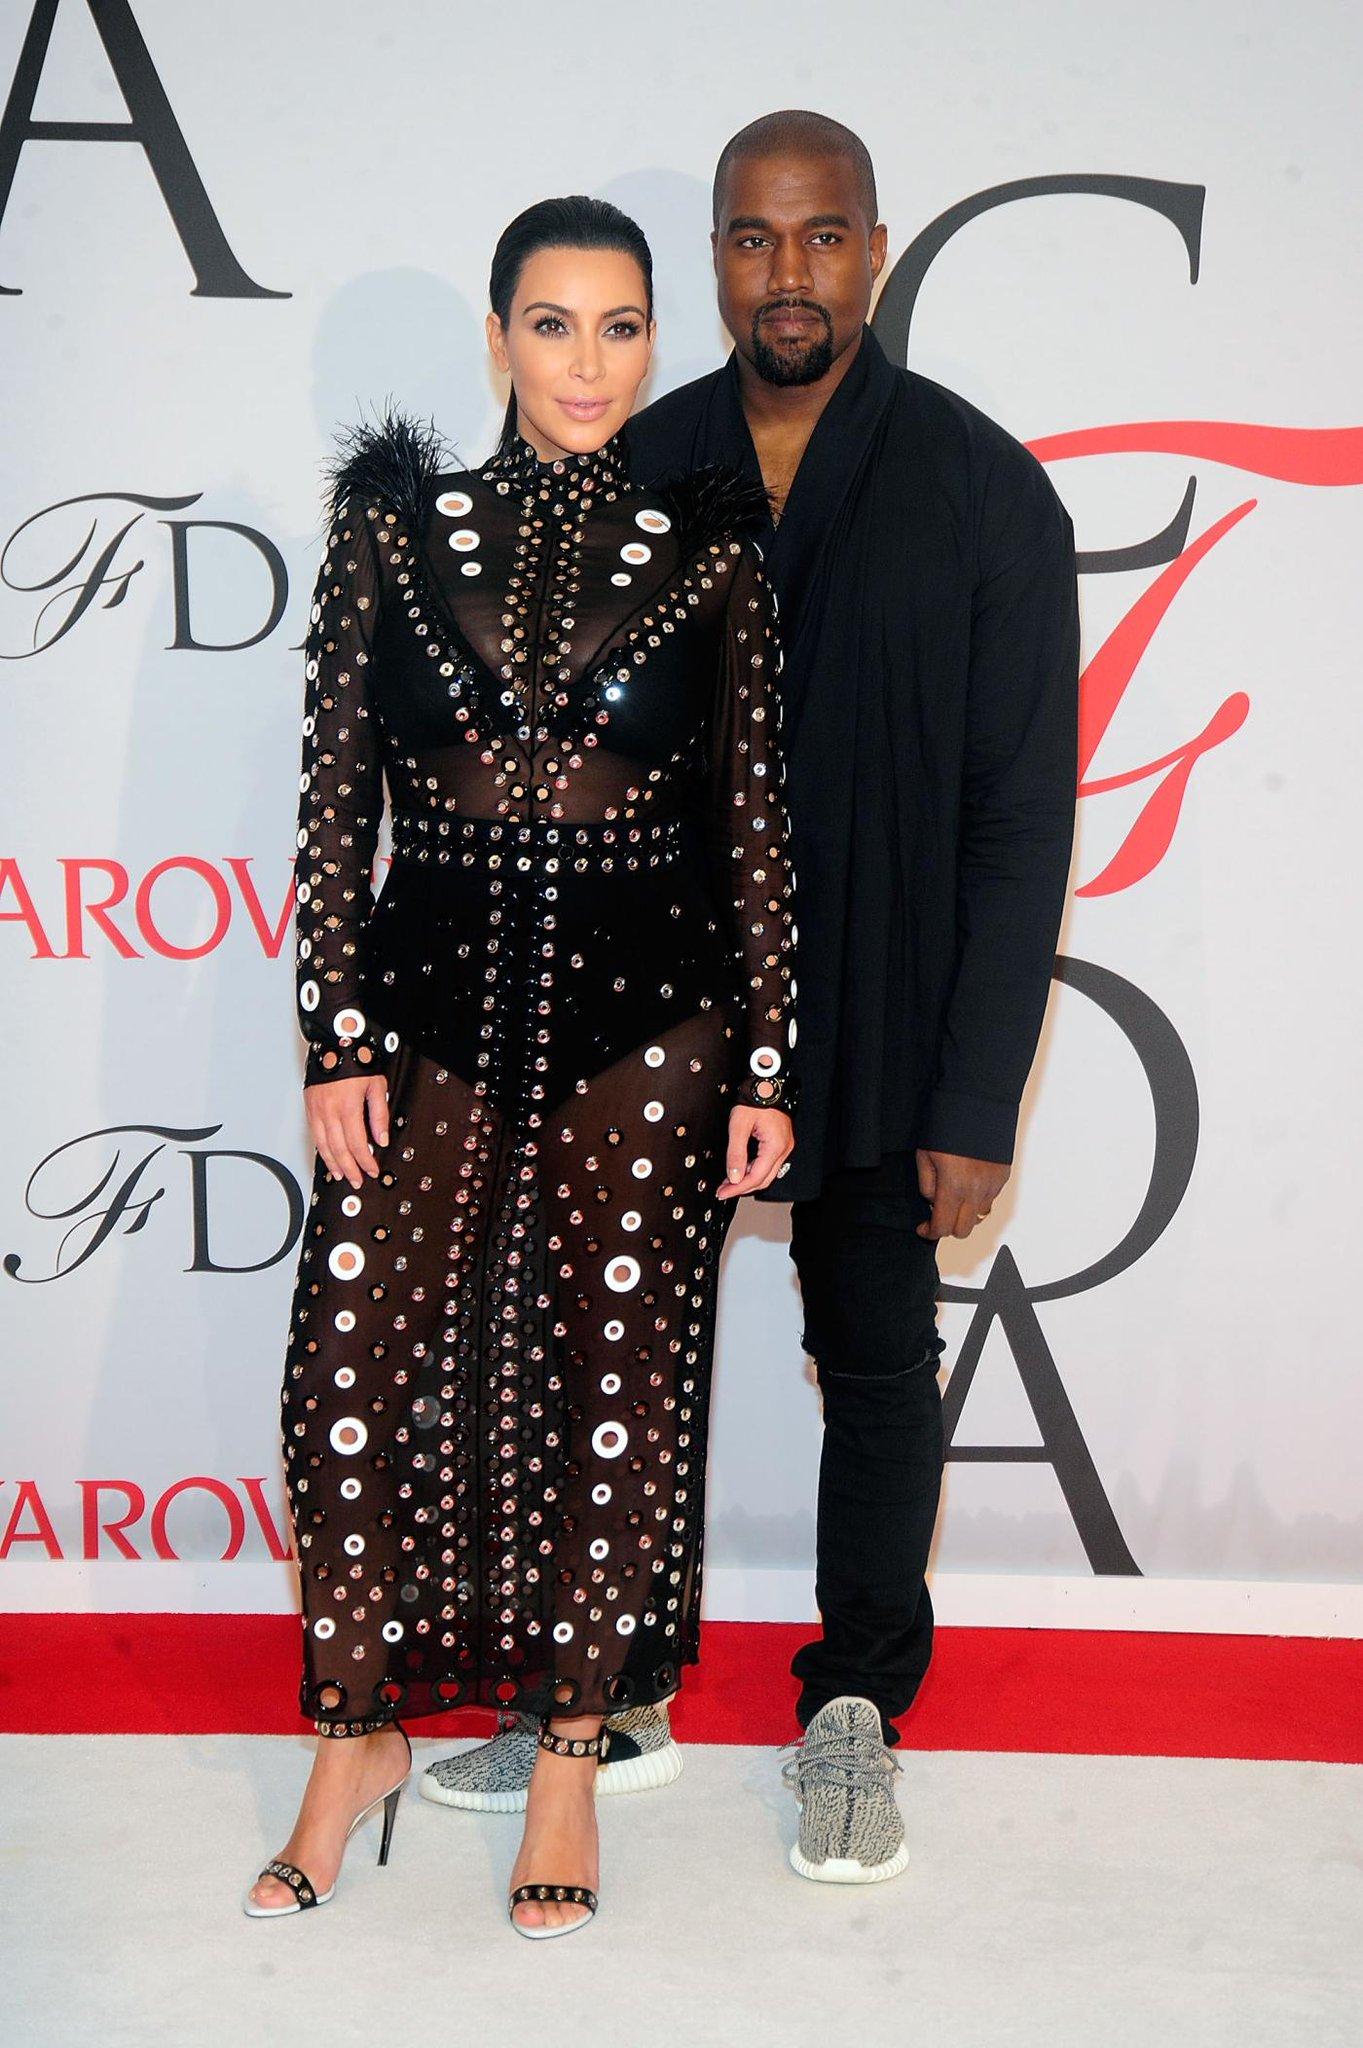 RT @GlobalGrind: Kim Kardashian reveals how she told Kanye she was pregnant http://t.co/CkFym3U4FE http://t.co/vvNYMBuBfN